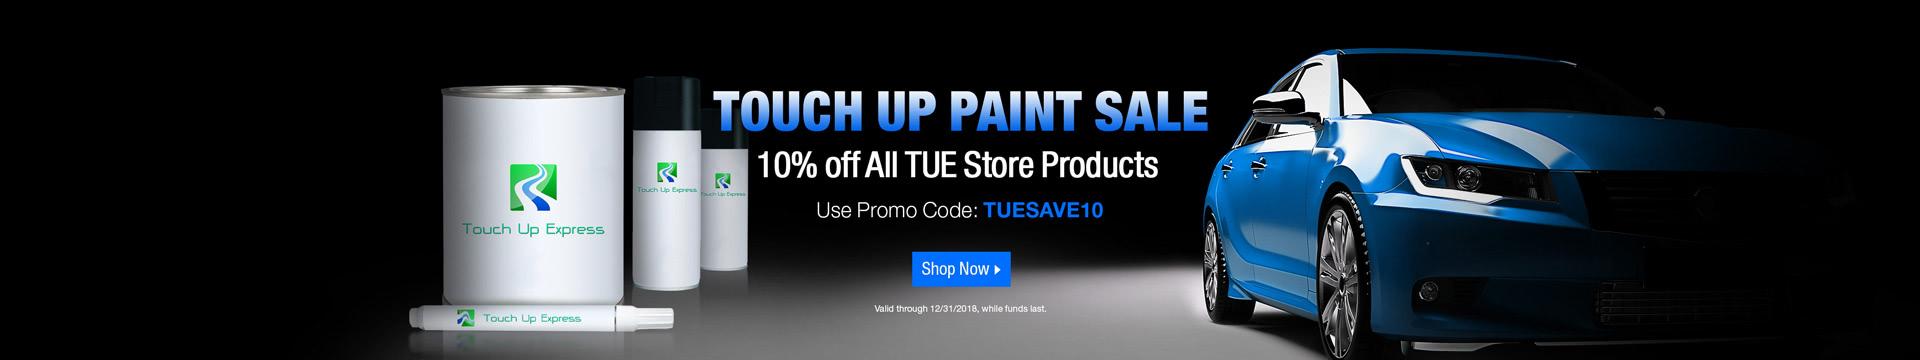 Touch up paint sale